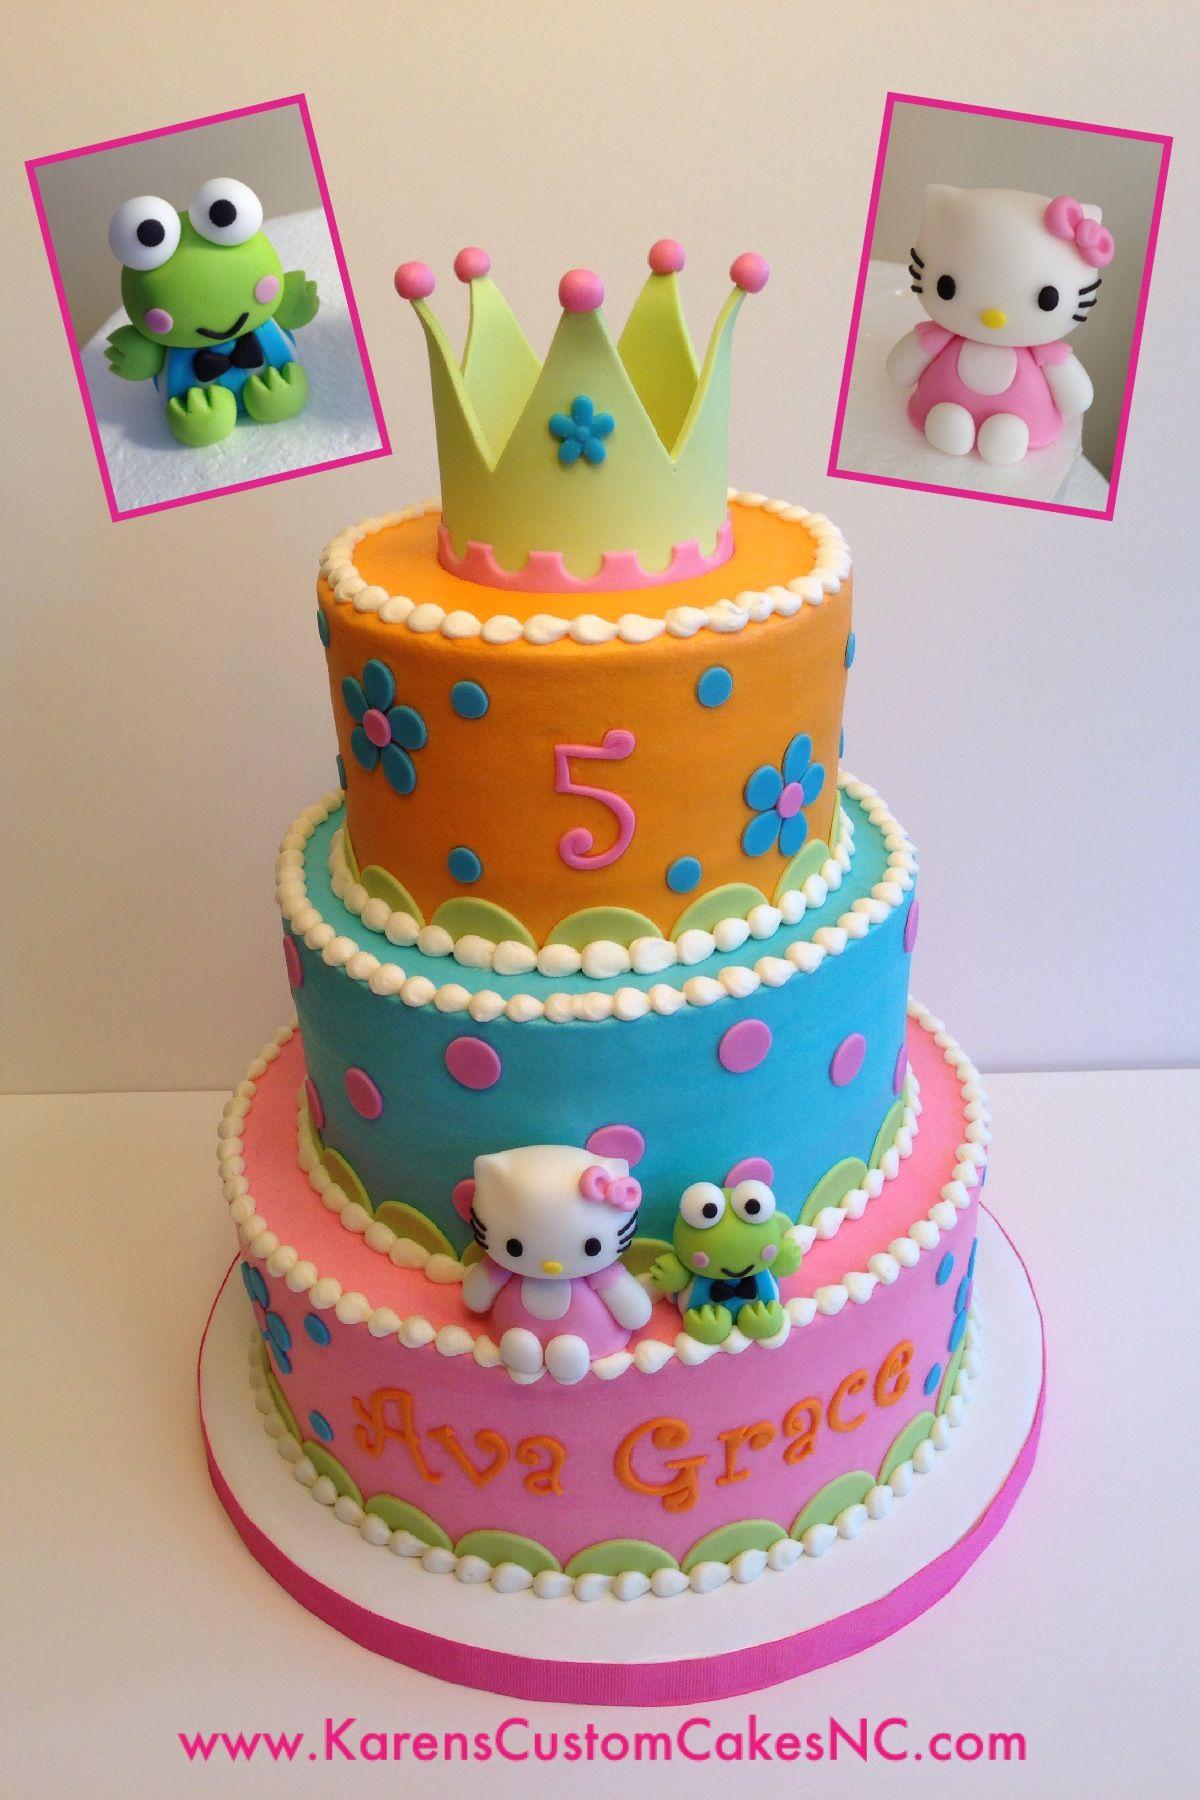 Surprising 3 Tier Colorful Hello Kitty Cake Buttercream With Fondant Decor Funny Birthday Cards Online Chimdamsfinfo